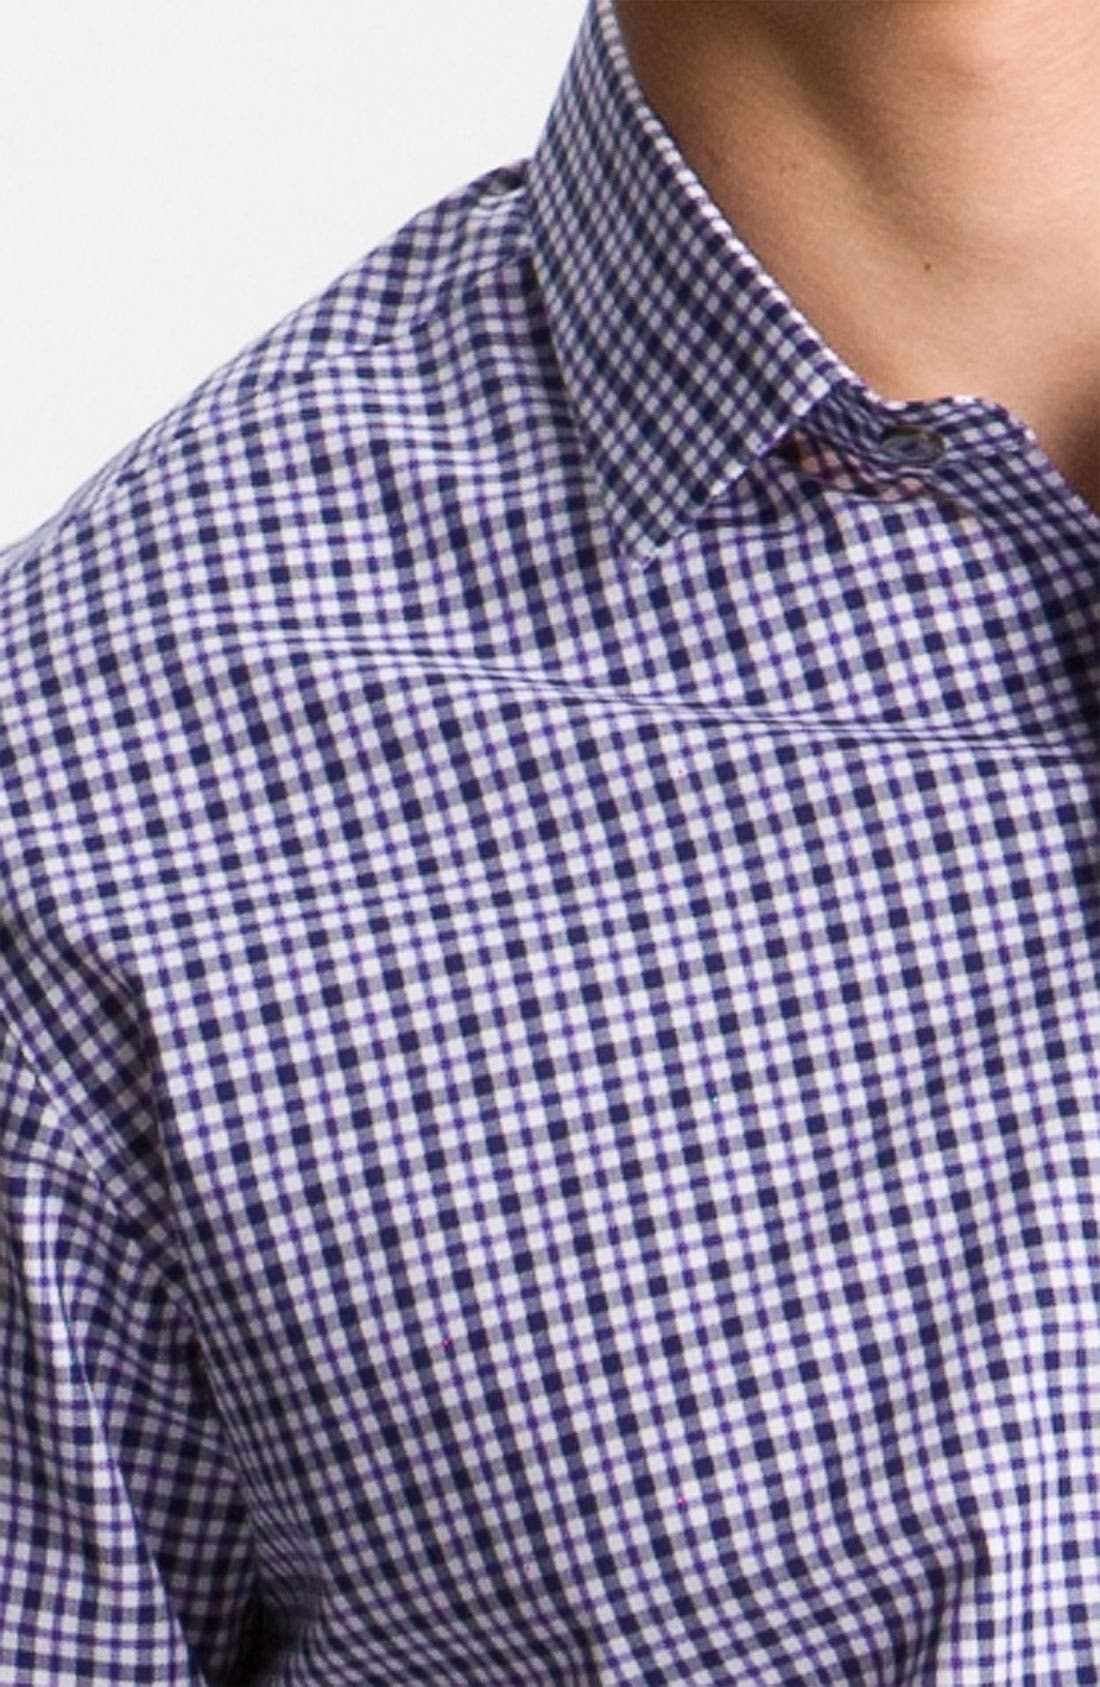 Alternate Image 2  - Zachary Prell 'Pallante' Sport Shirt